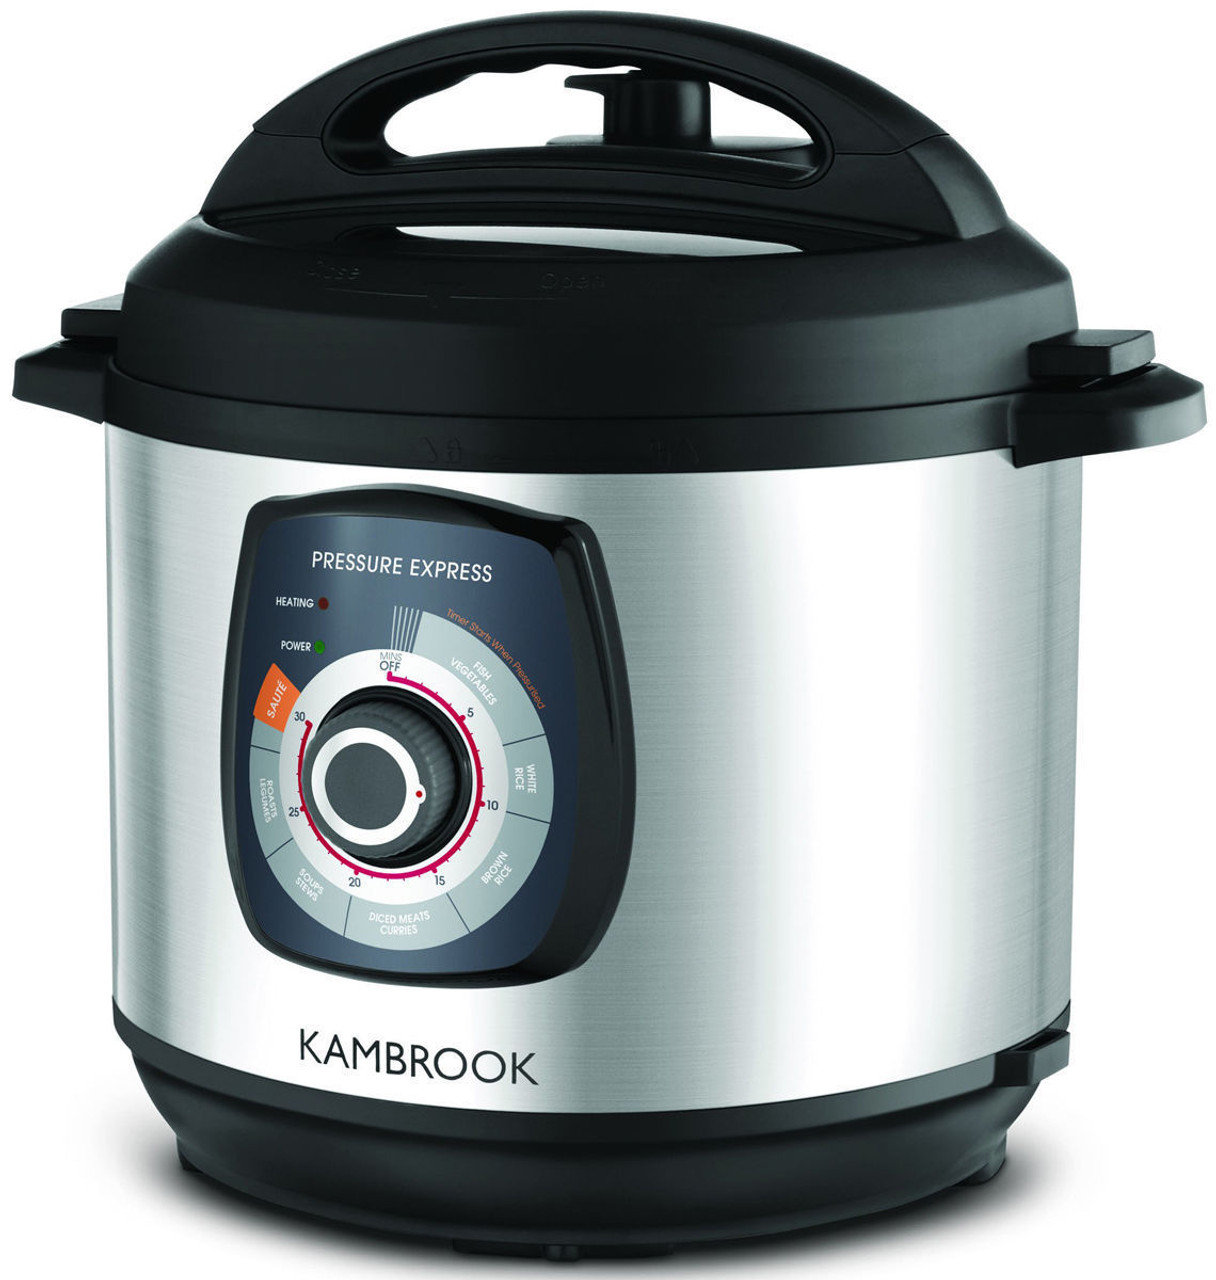 Kambrook KPR620BSS Pressure Express Pressure Cooker Sauté & Pressure Cook